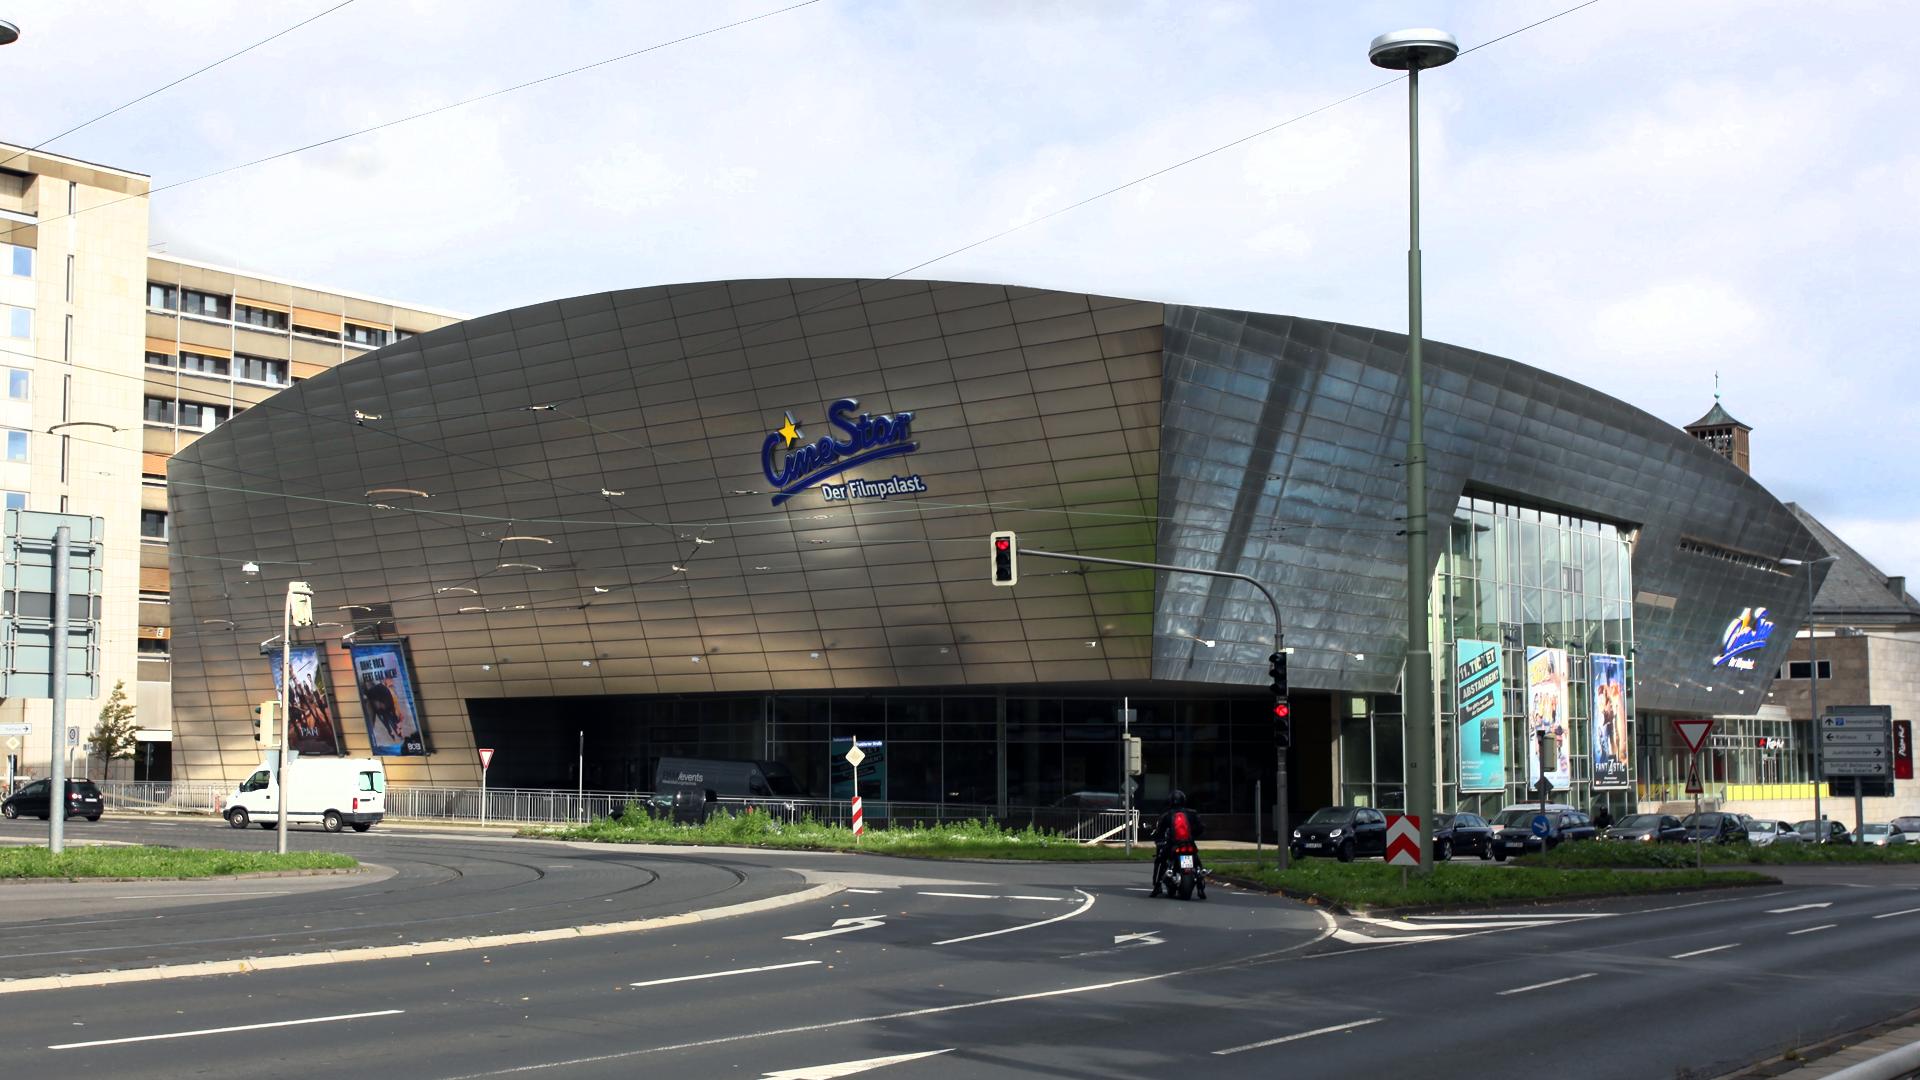 Cinestar Nordhausen